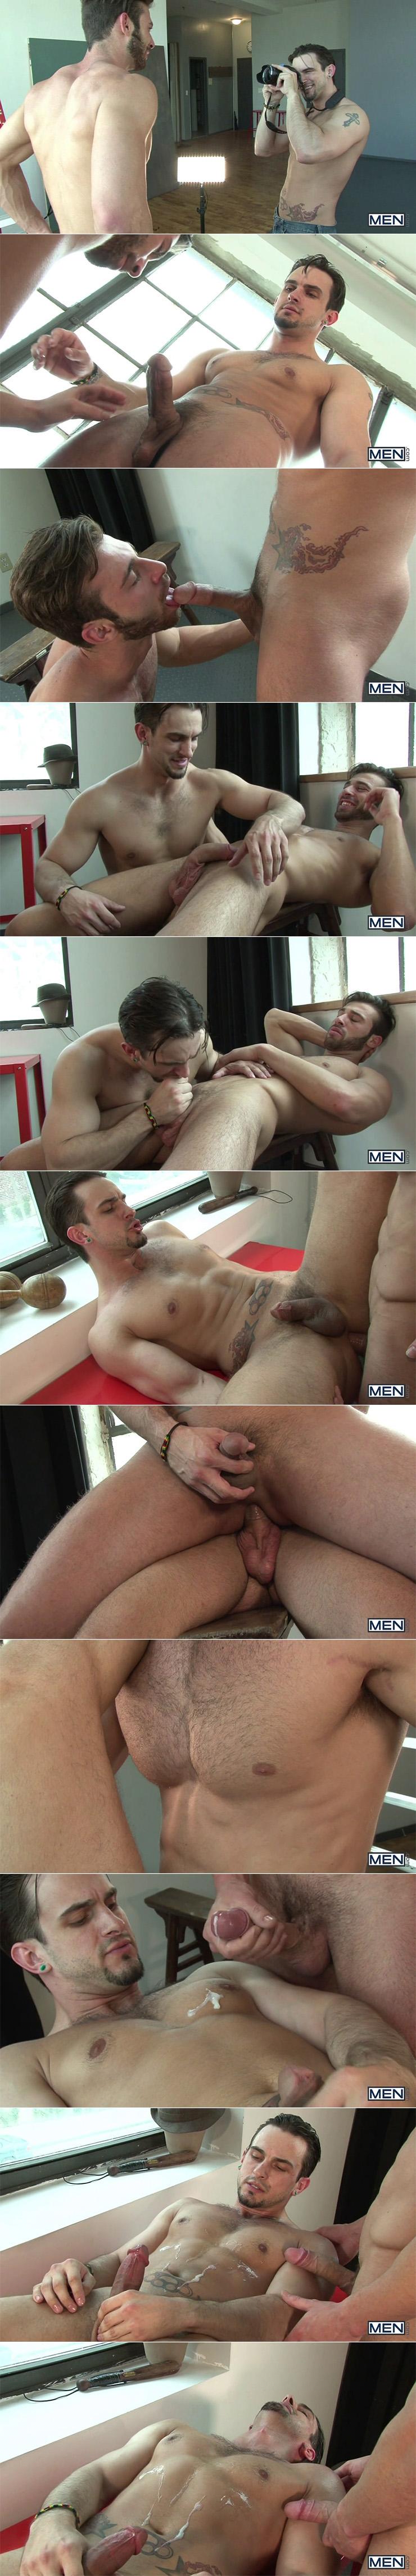 MEN Body Shots Jarec Wentworth Phenix Saint Gay Condom Sex male Feet Big Uncut Cock Oral Sex Cumshots Tattoos stills